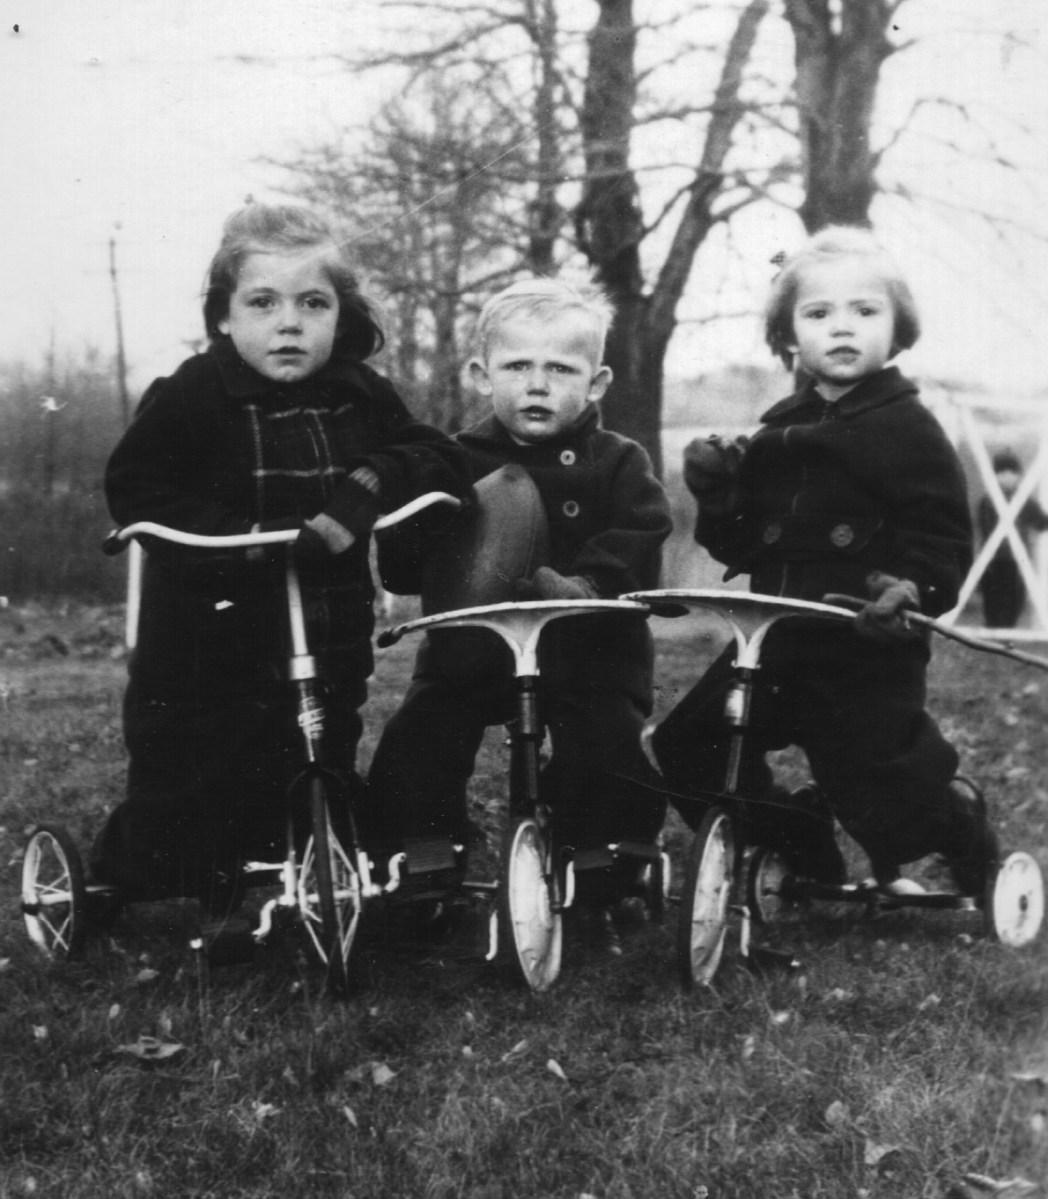 Nancy, George, and Sally around 1939